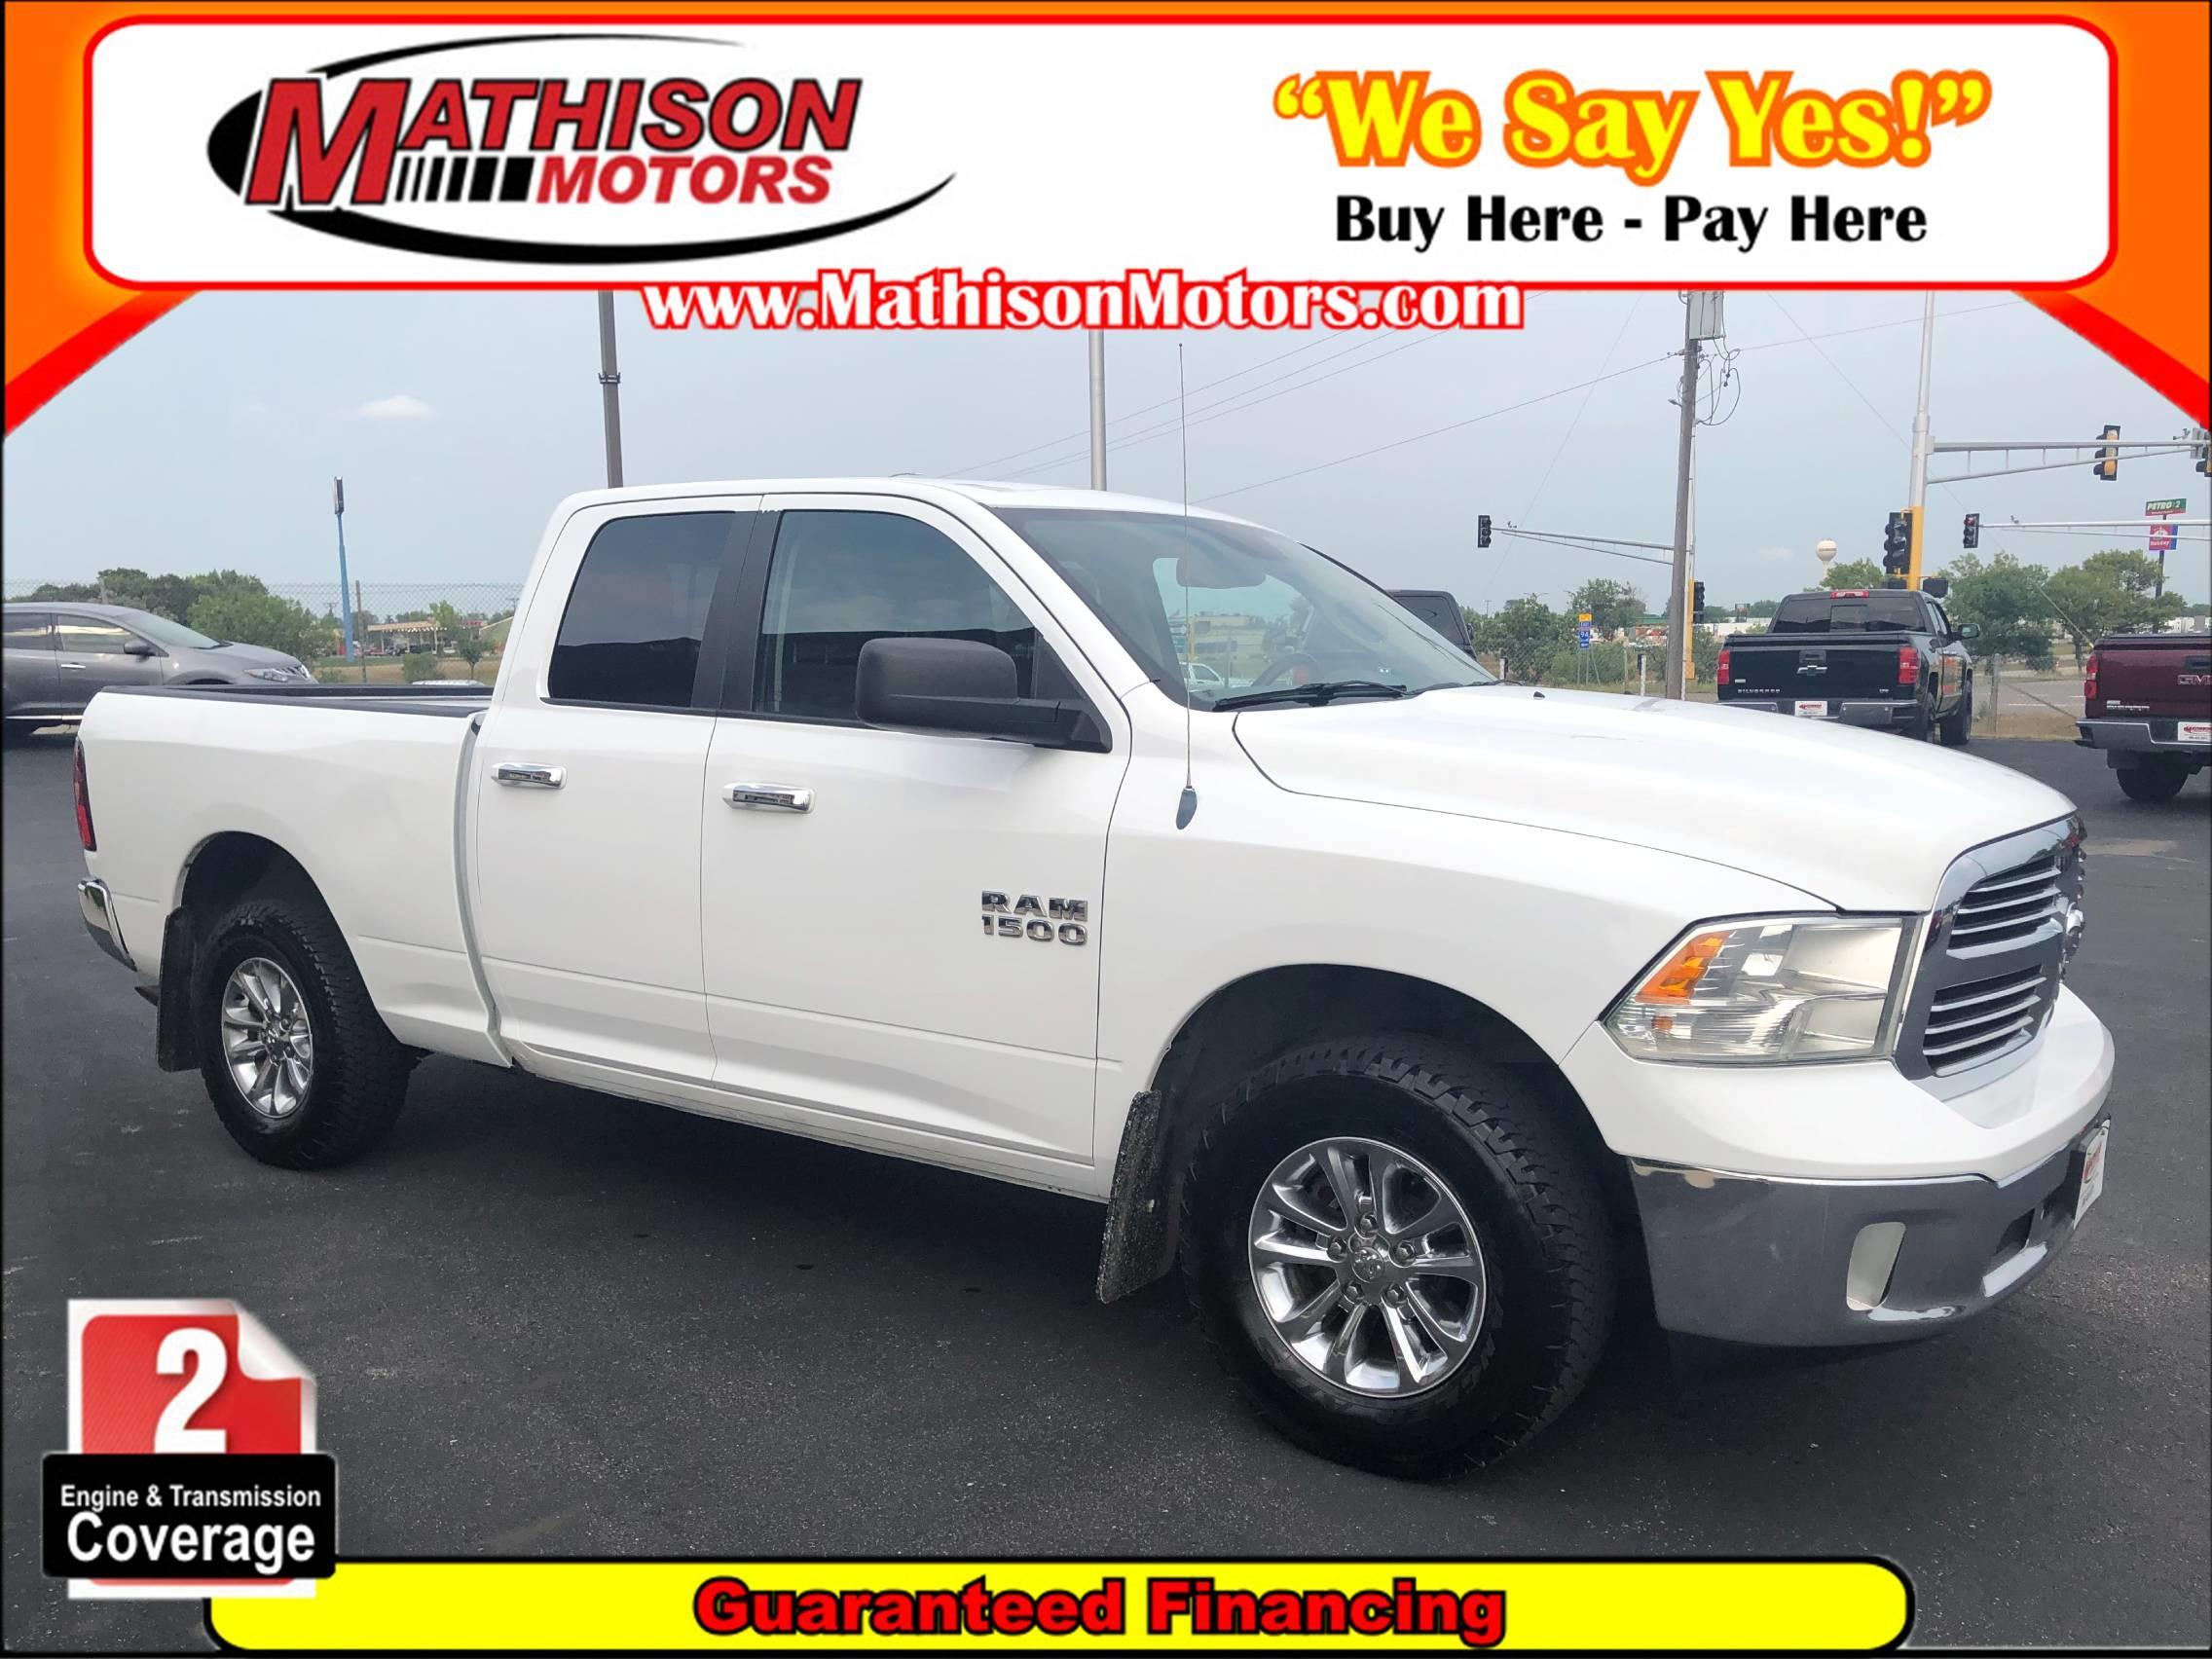 used vehicle - Truck RAM 1500 2013